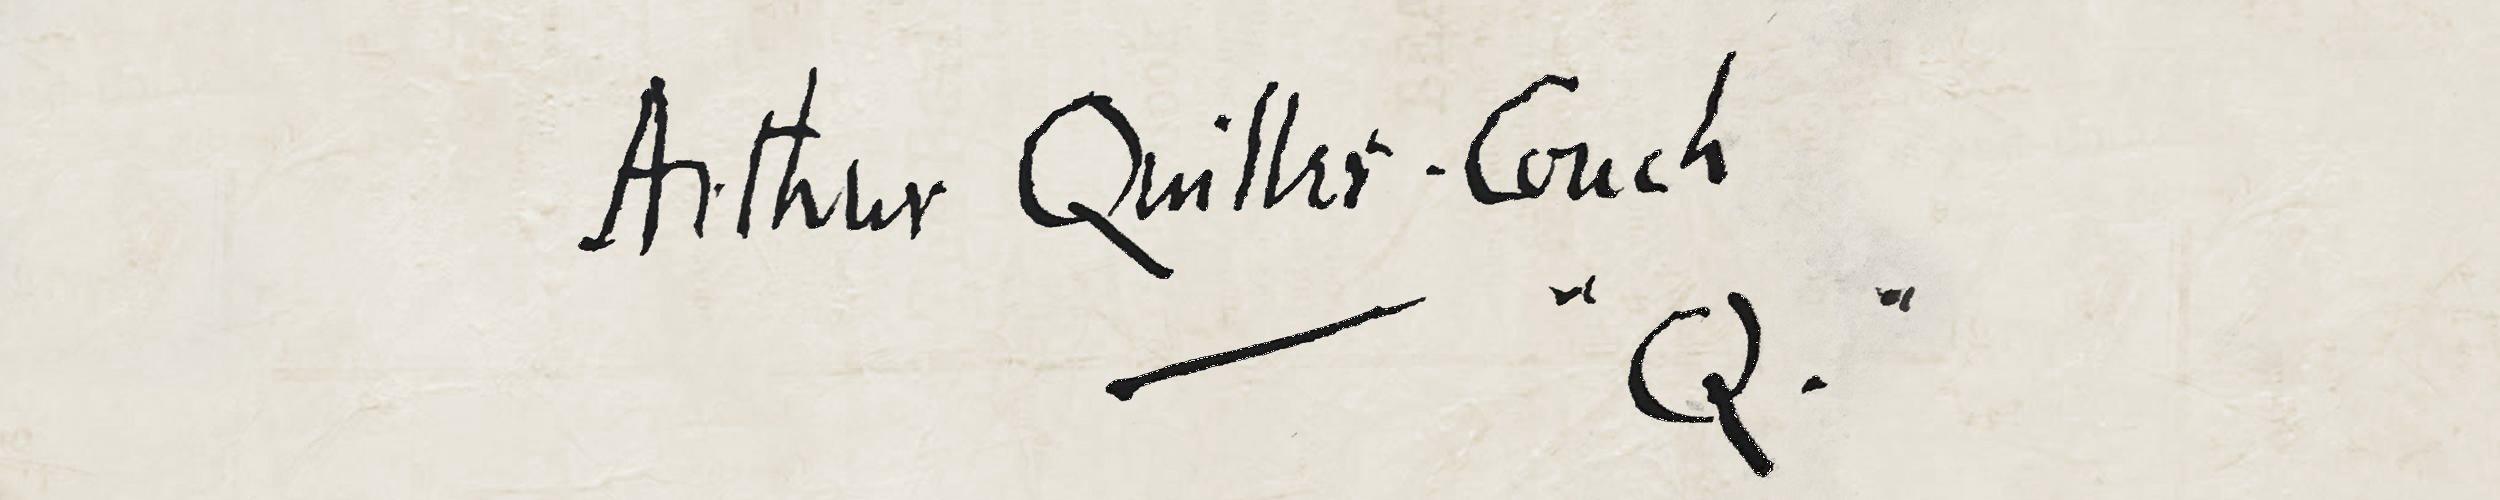 Arthur Quiller-Couch's Signature